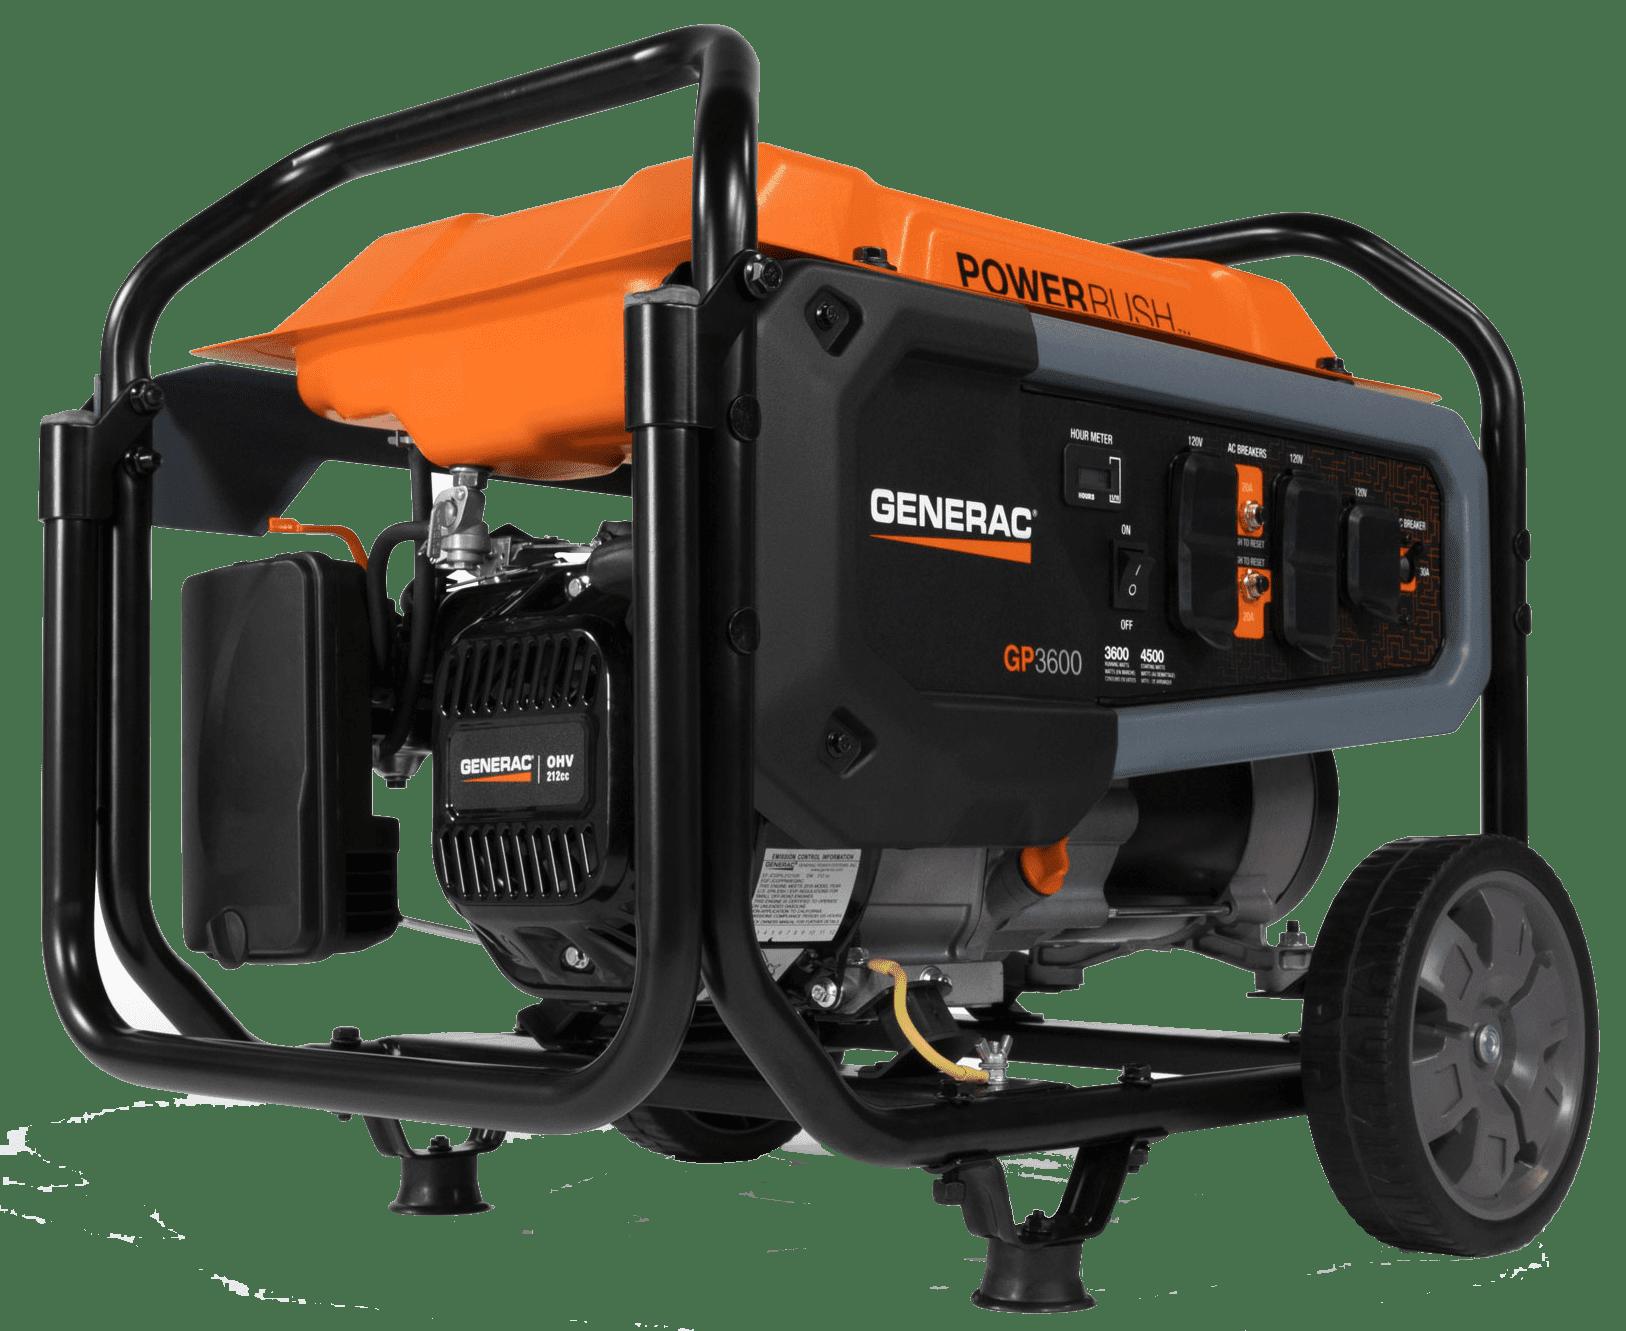 Generac GP 3600 Portable Generator